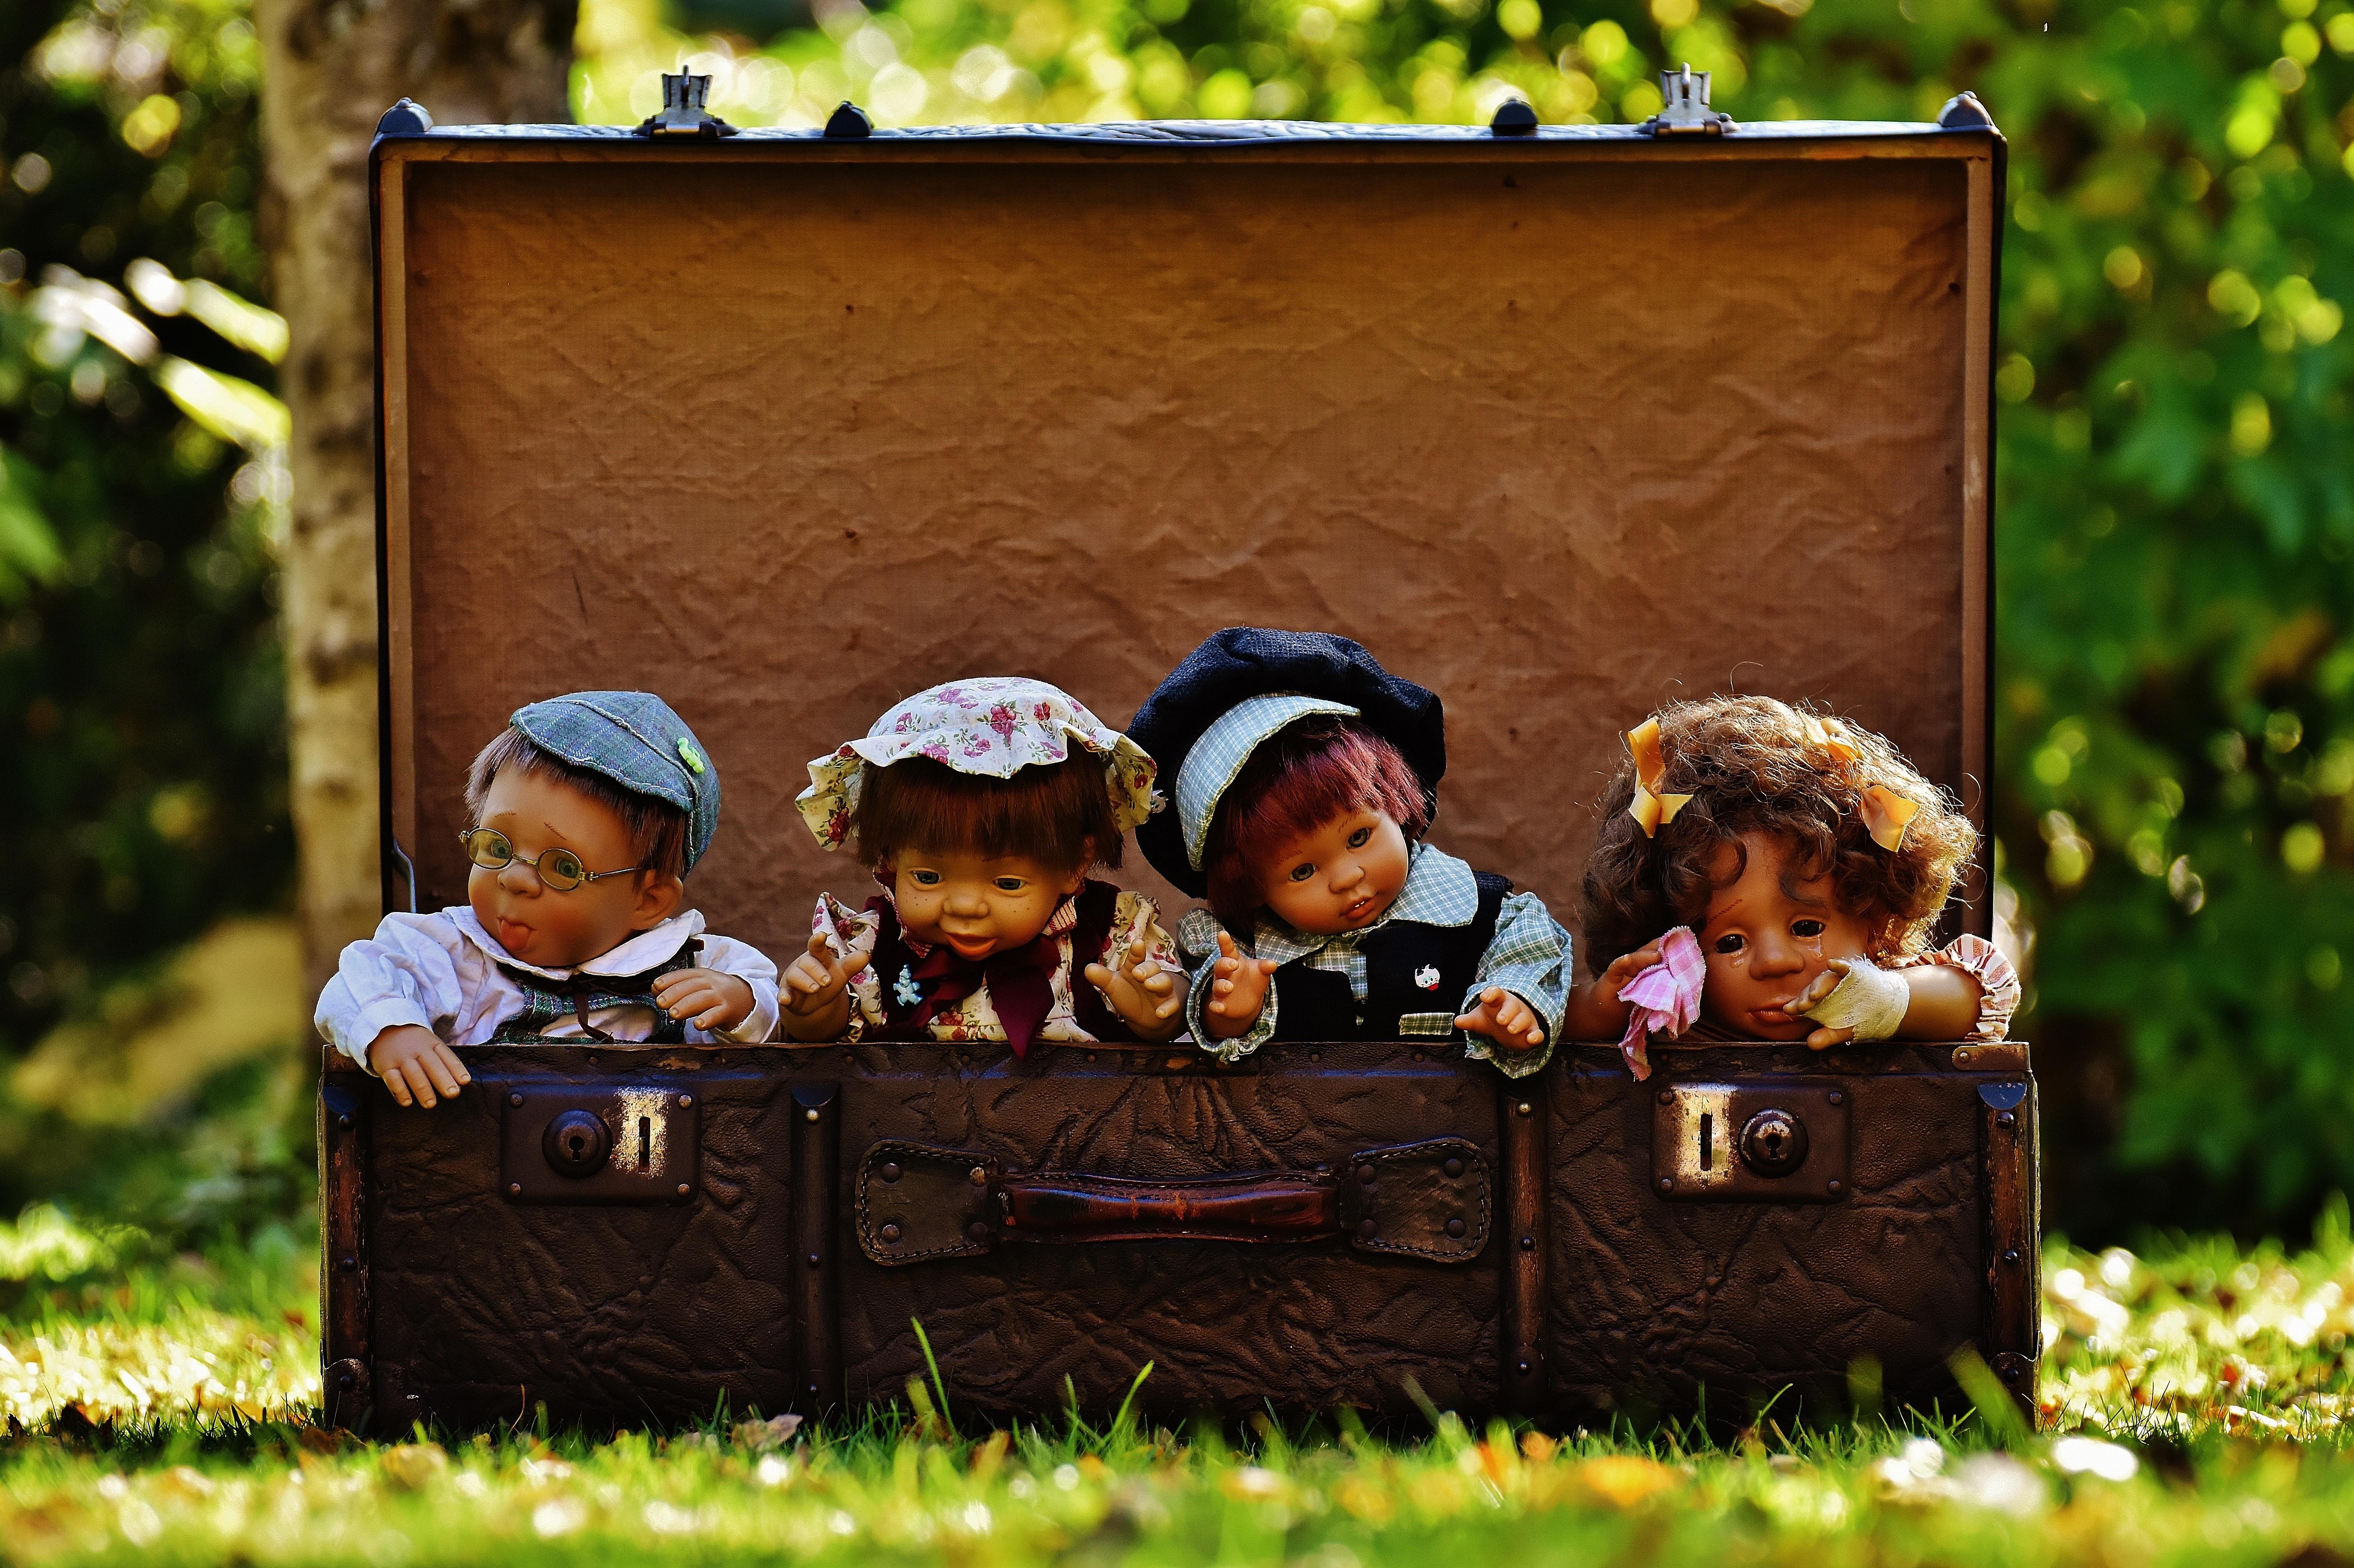 4 porcelain dolls in brown rectangular box photo